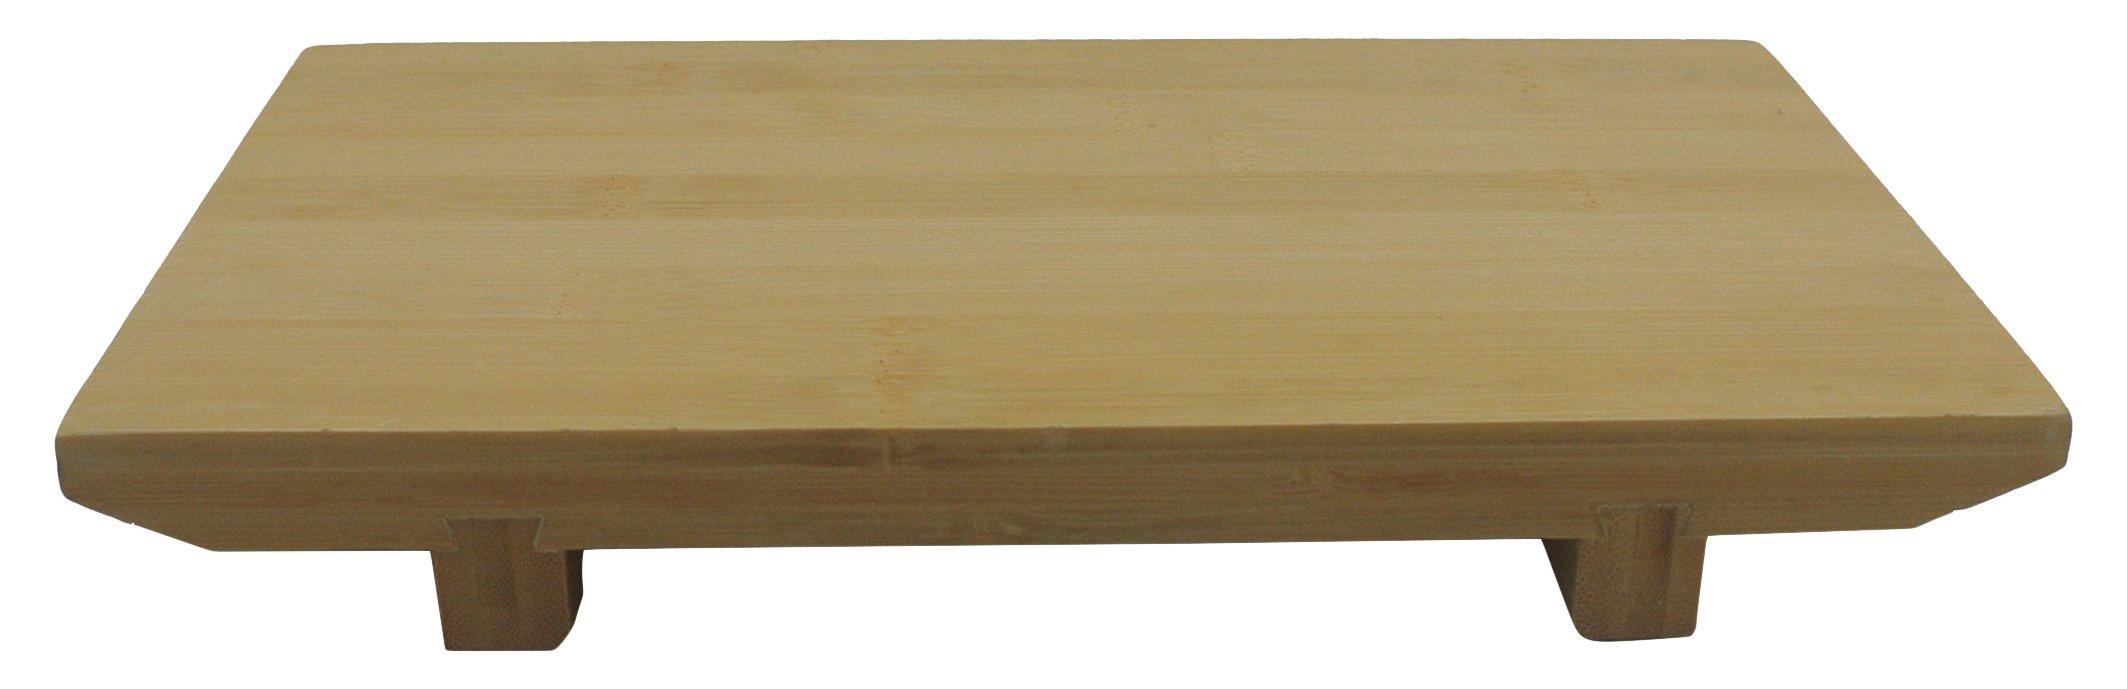 JapanBargain S-4090, Bamboo Sushi Geta Serving Plate, 9.75'' L x 6'' W, Large